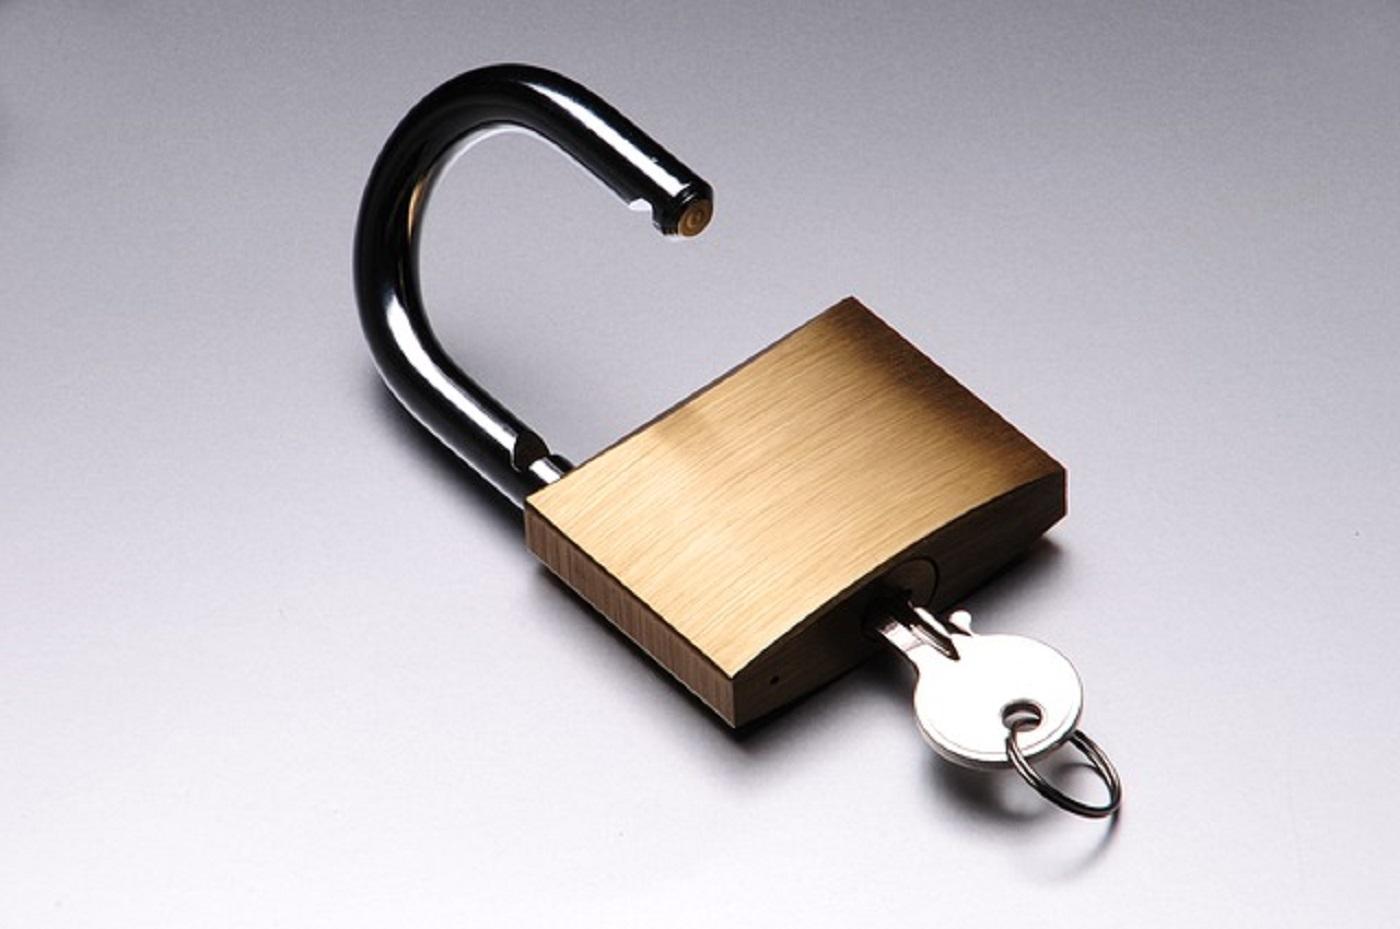 how to unlock icloud via IMEI